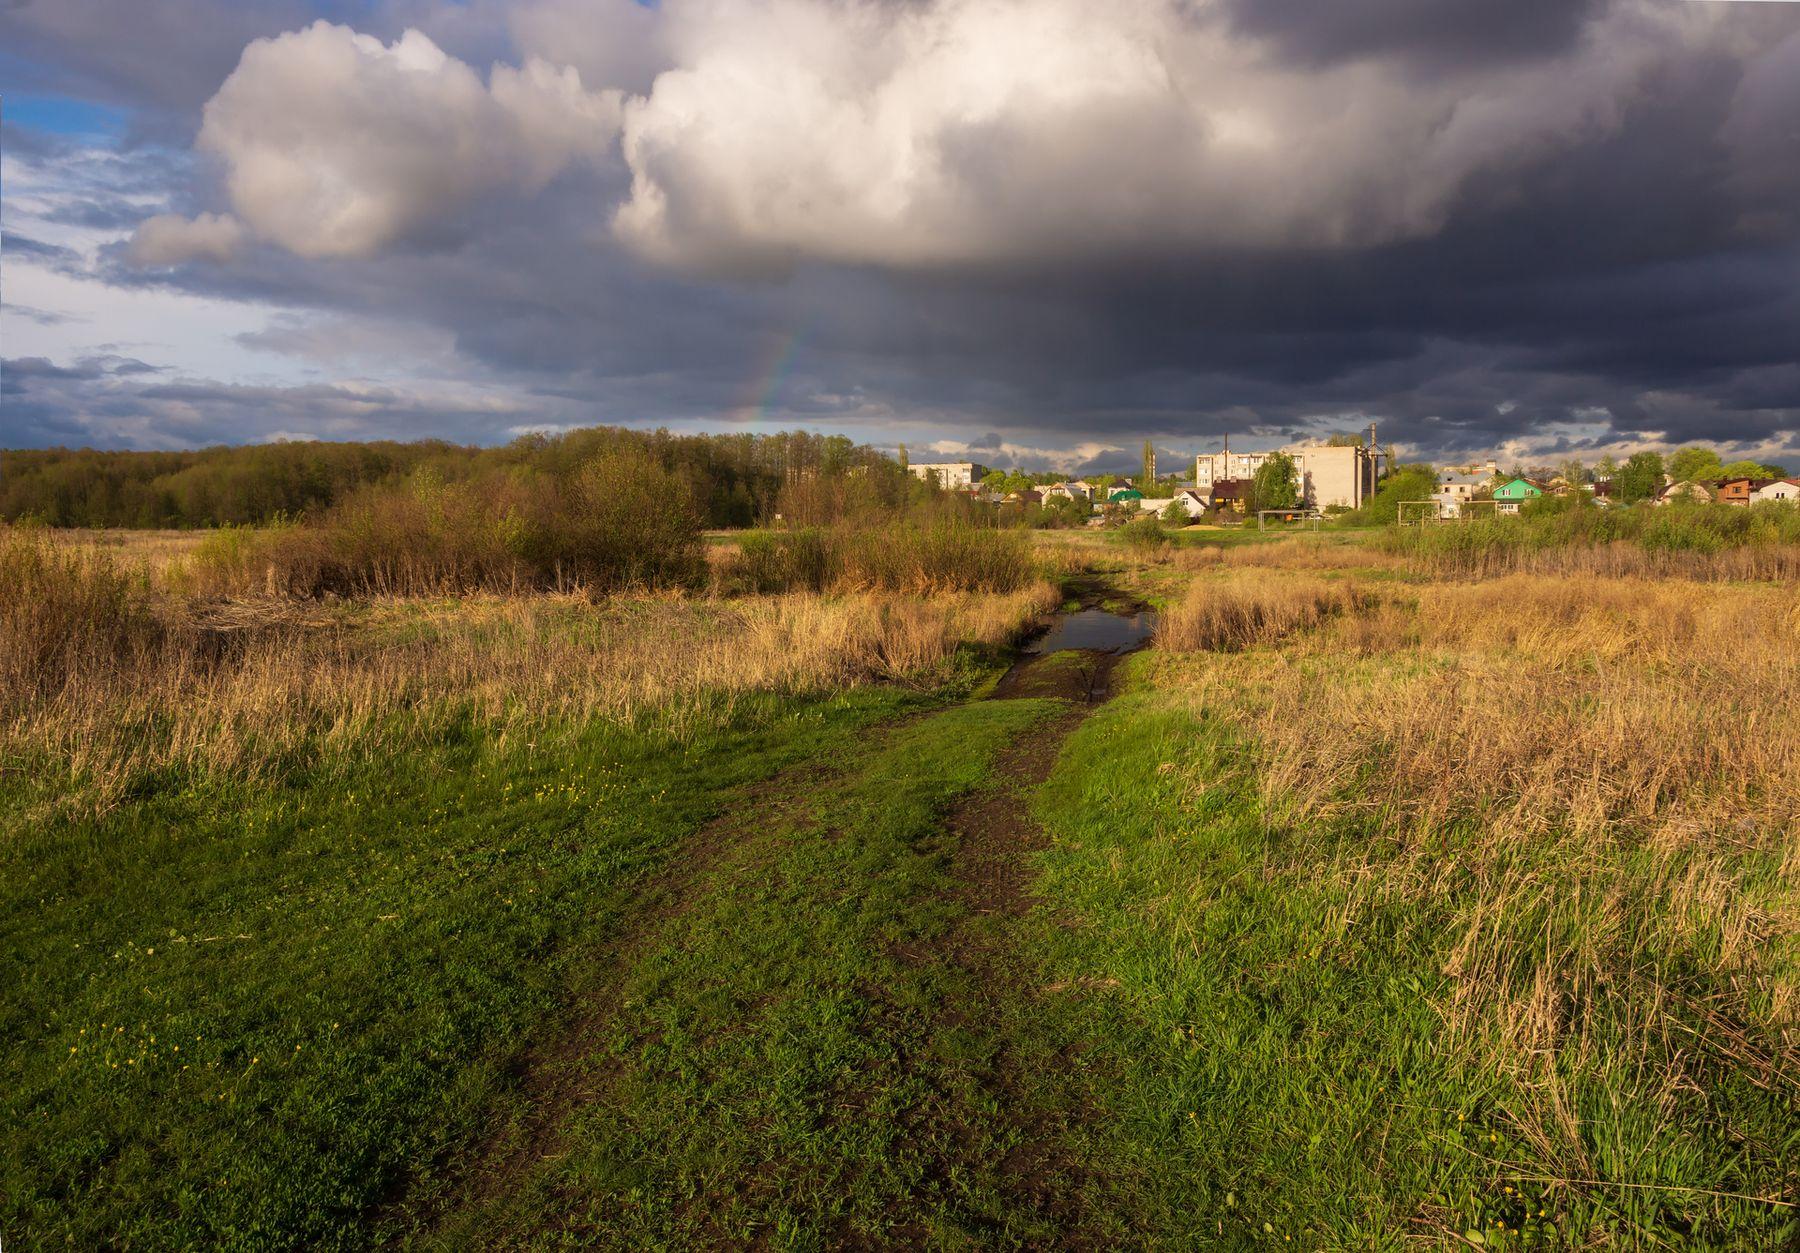 Провожая тучу пейзаж природа весна вечер солнце туча река Усманка Сомово луг Воронеж